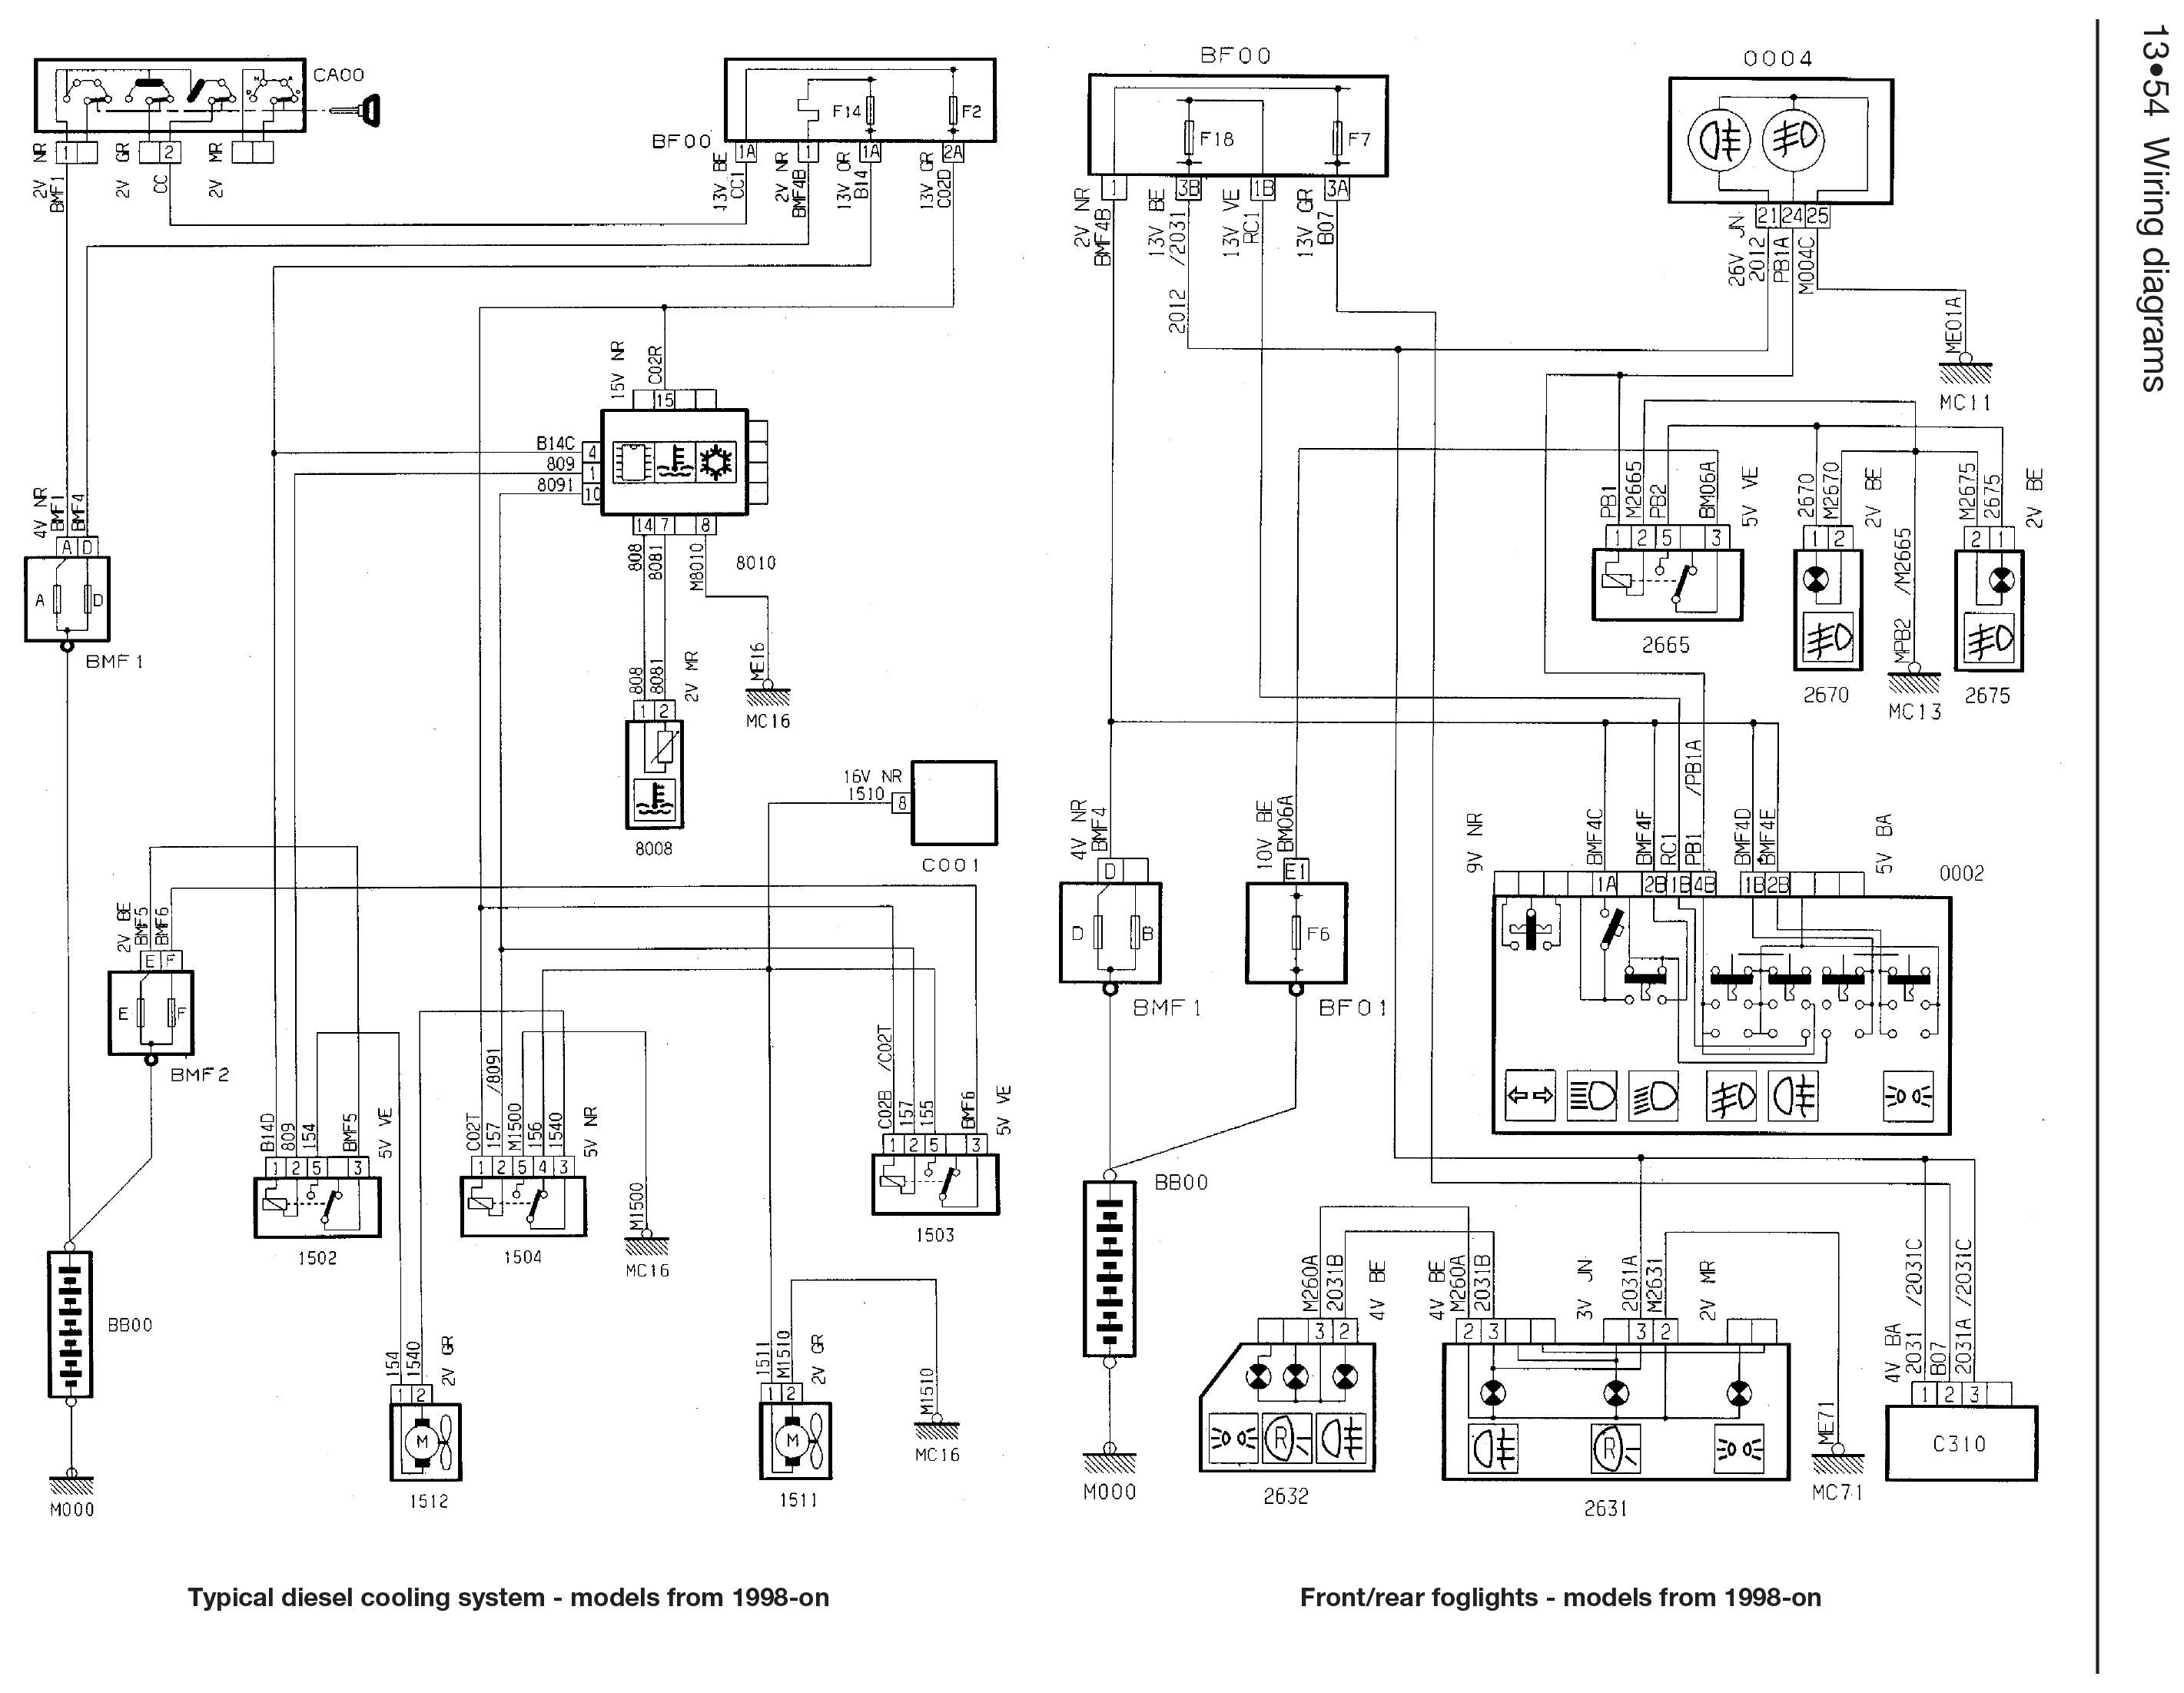 Citroen xantia petrol diesel 93 01 haynes repair manual citroen xantia petrol diesel 93 01 haynes repair manual cheapraybanclubmaster Images